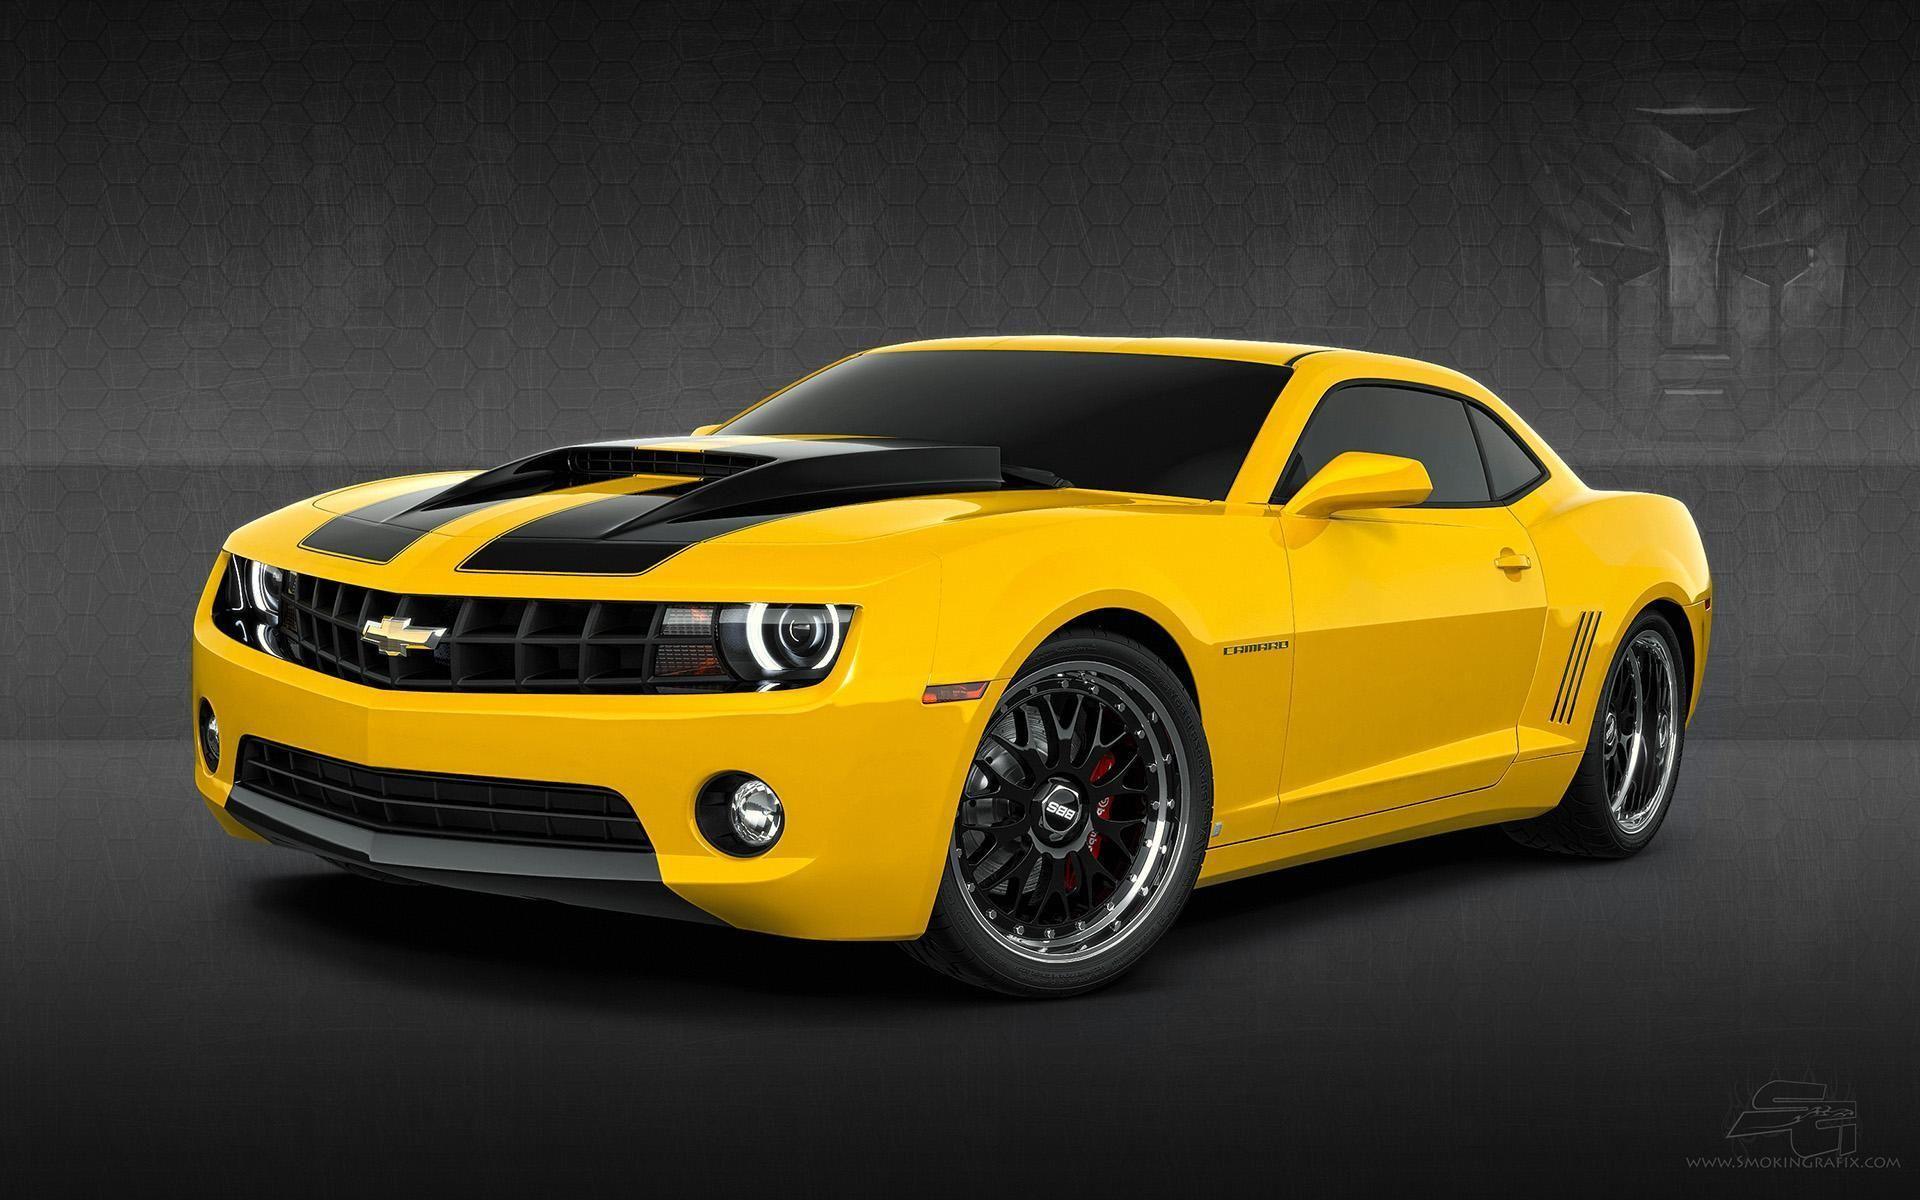 Yellow Camaro Wallpapers Top Free Yellow Camaro Backgrounds